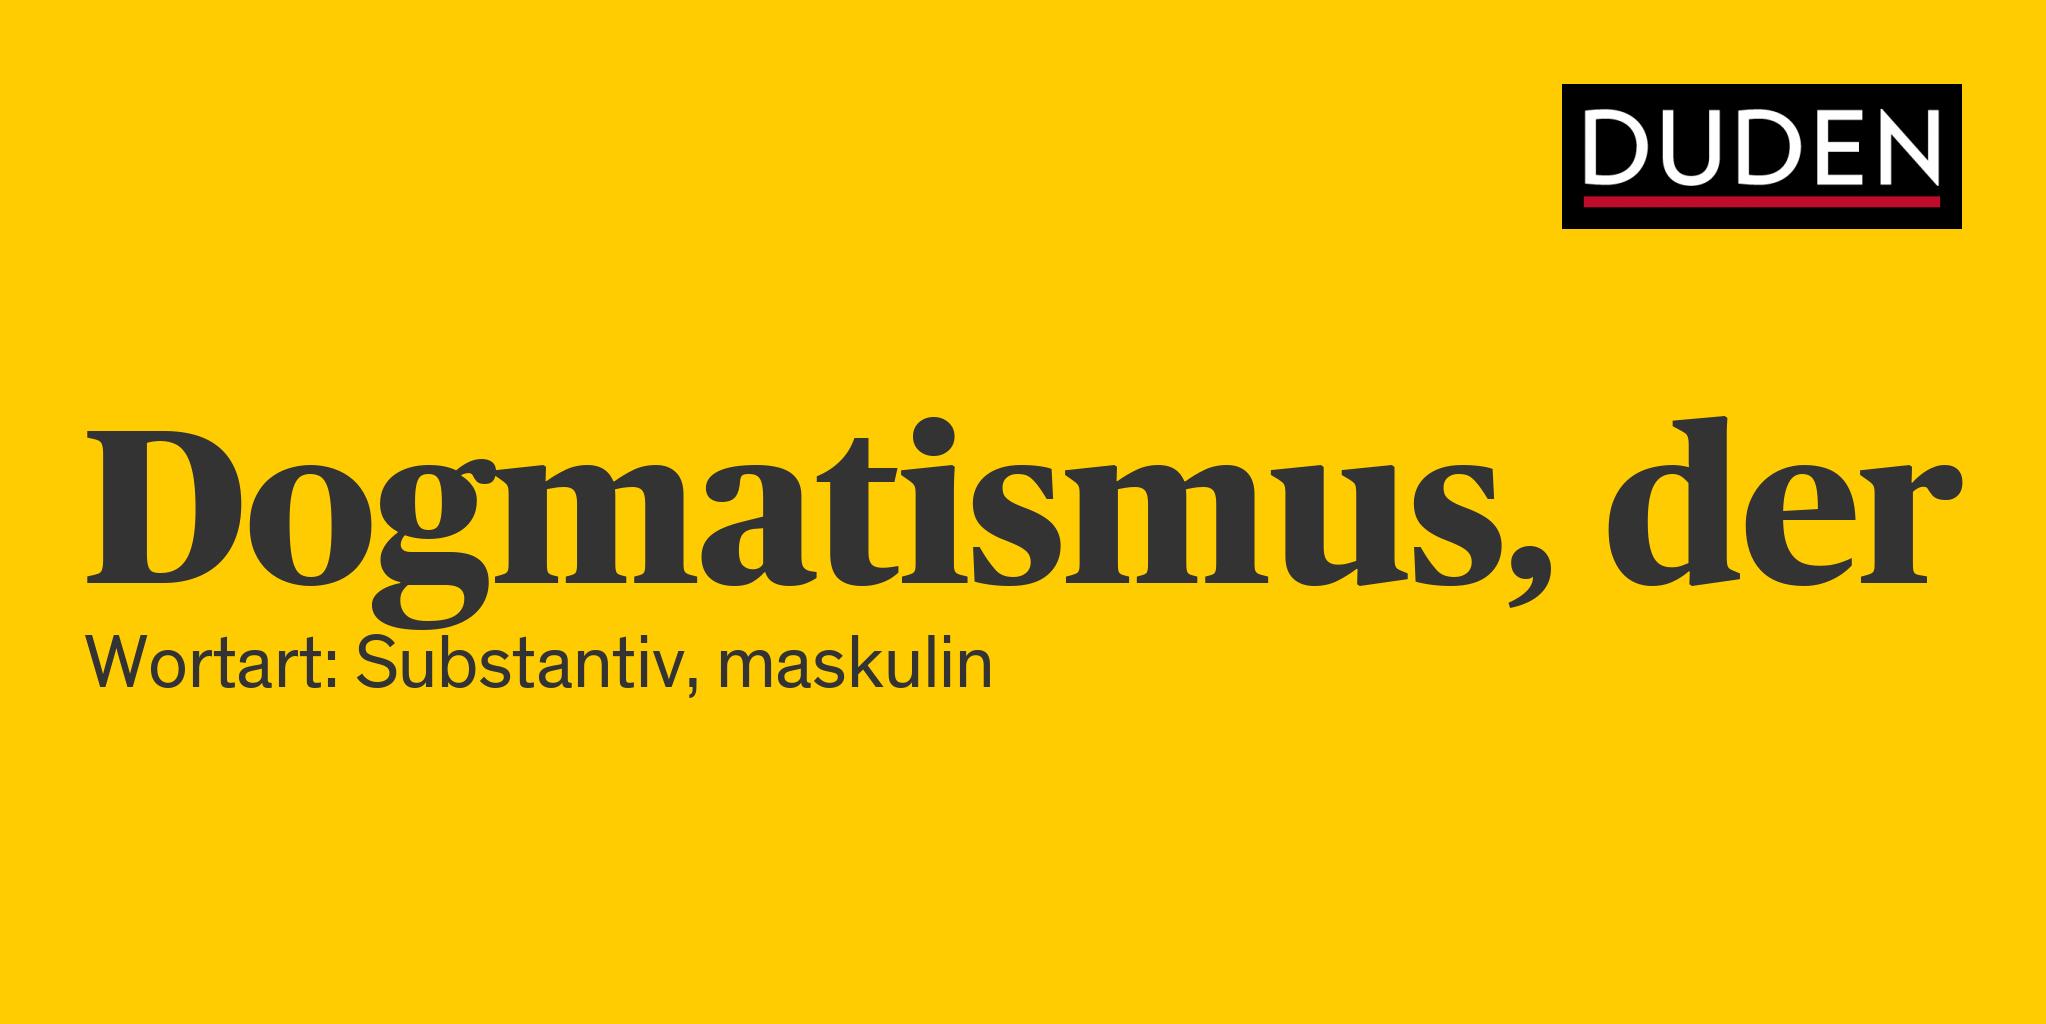 Dogmatismus Definition